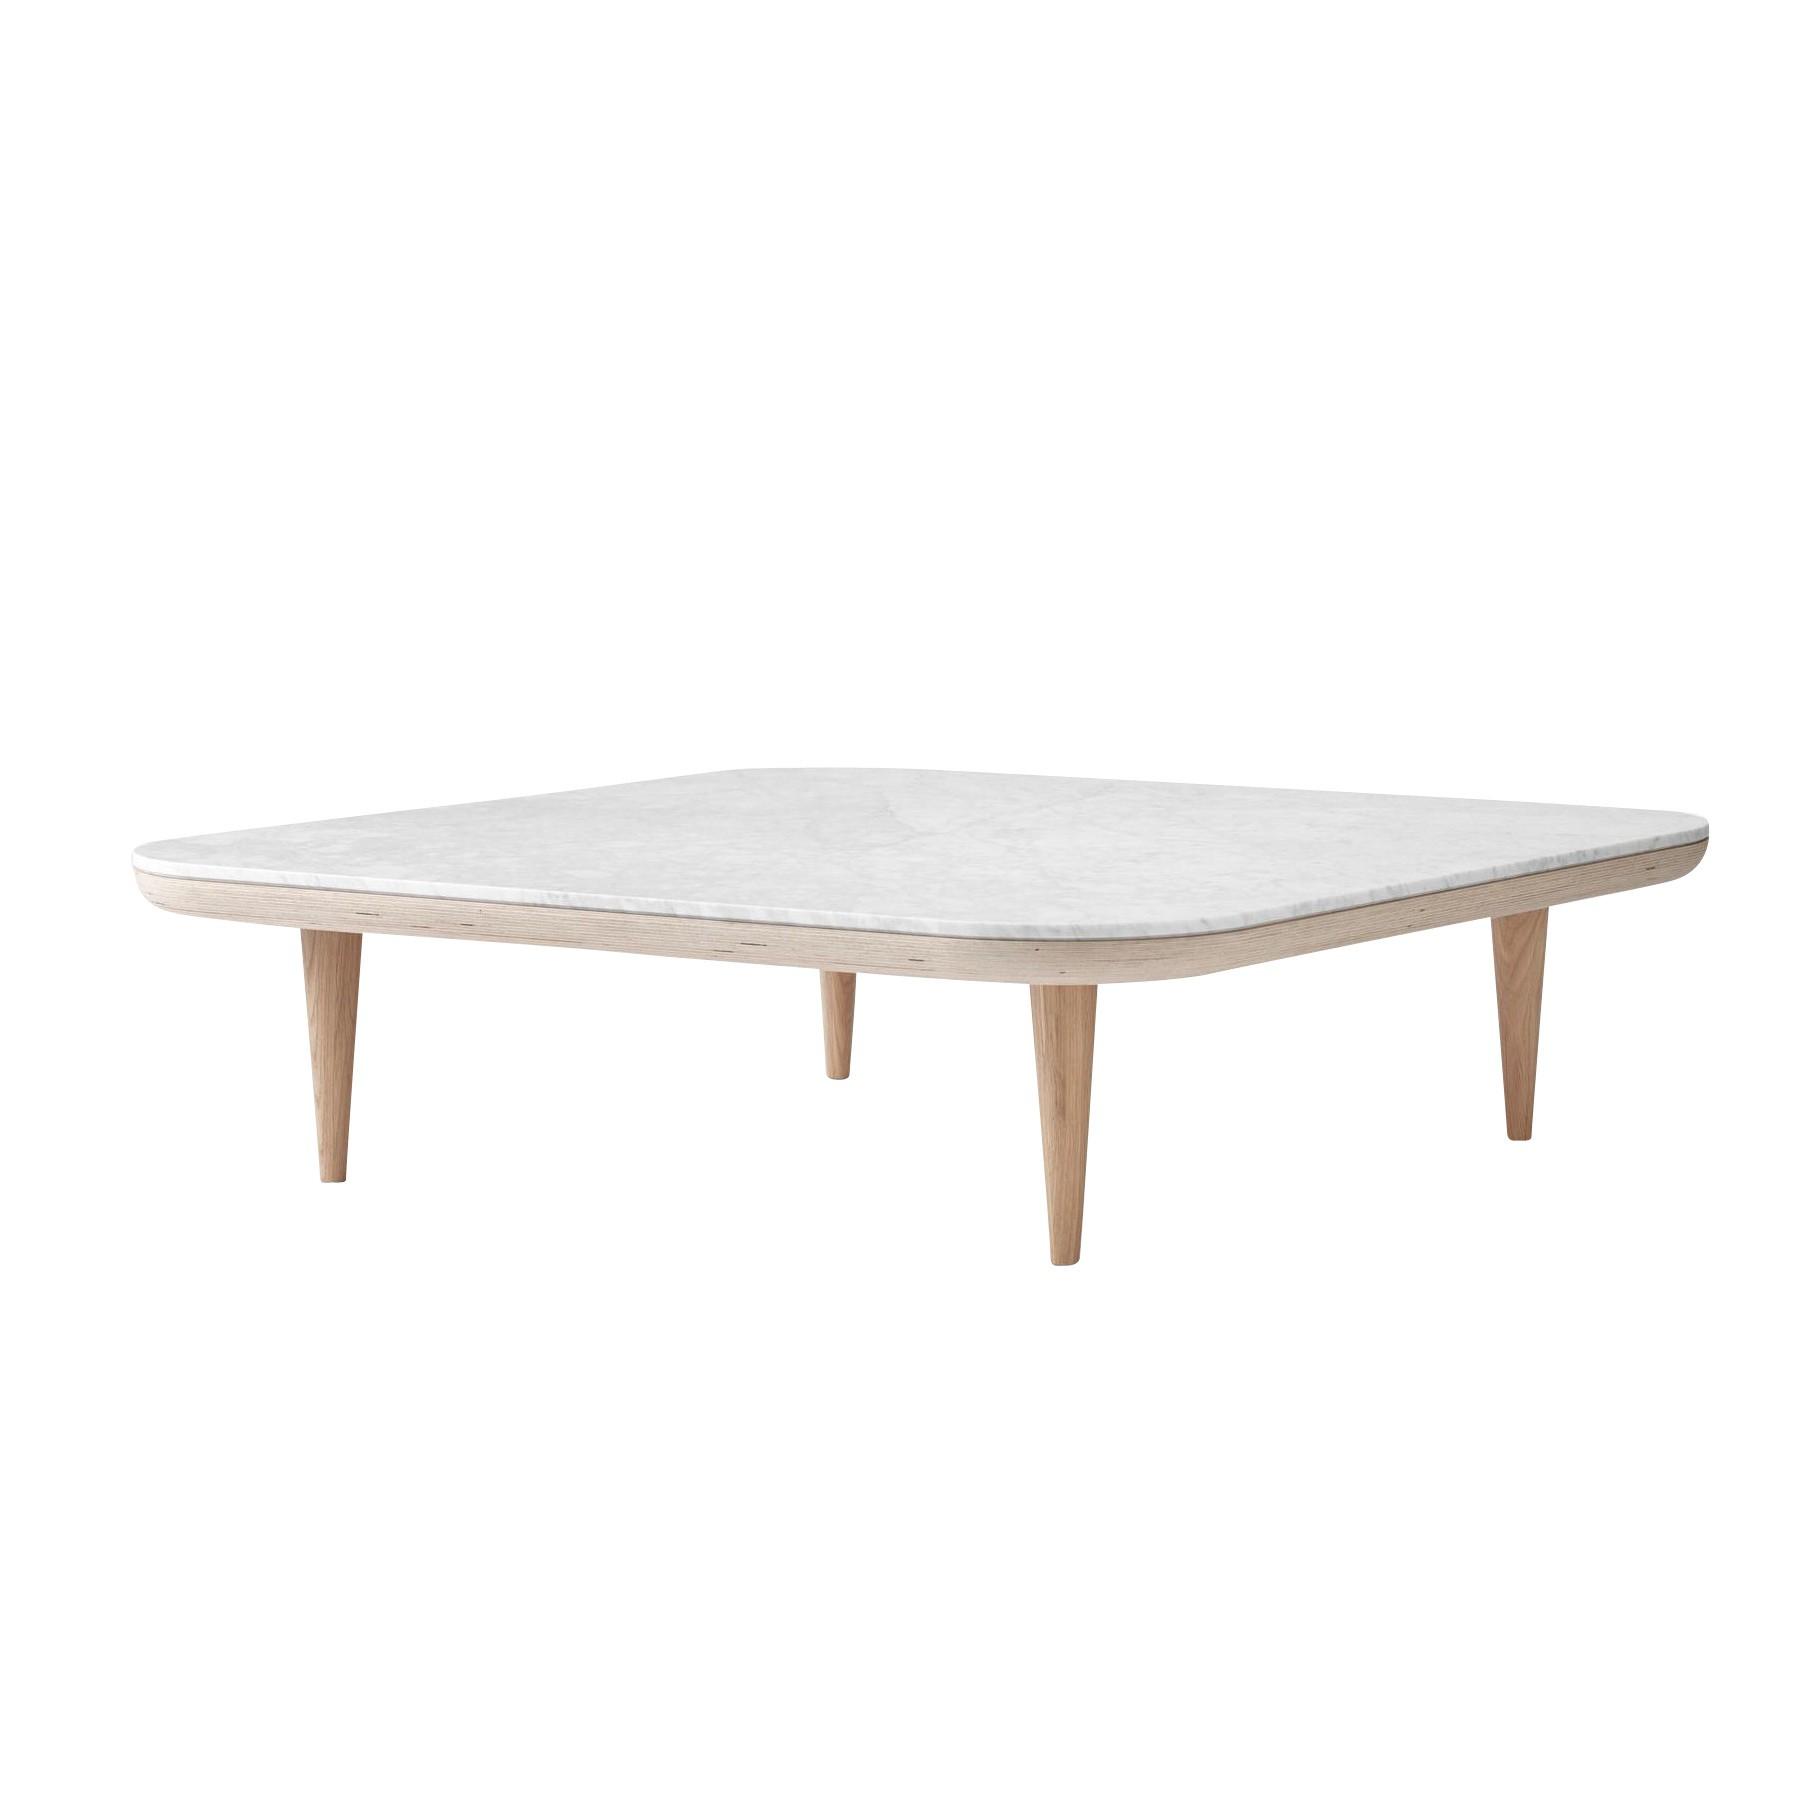 de52943b2651 &tradition FLY Table SC11 - Mesa de centro 120x120cm | AmbienteDirect